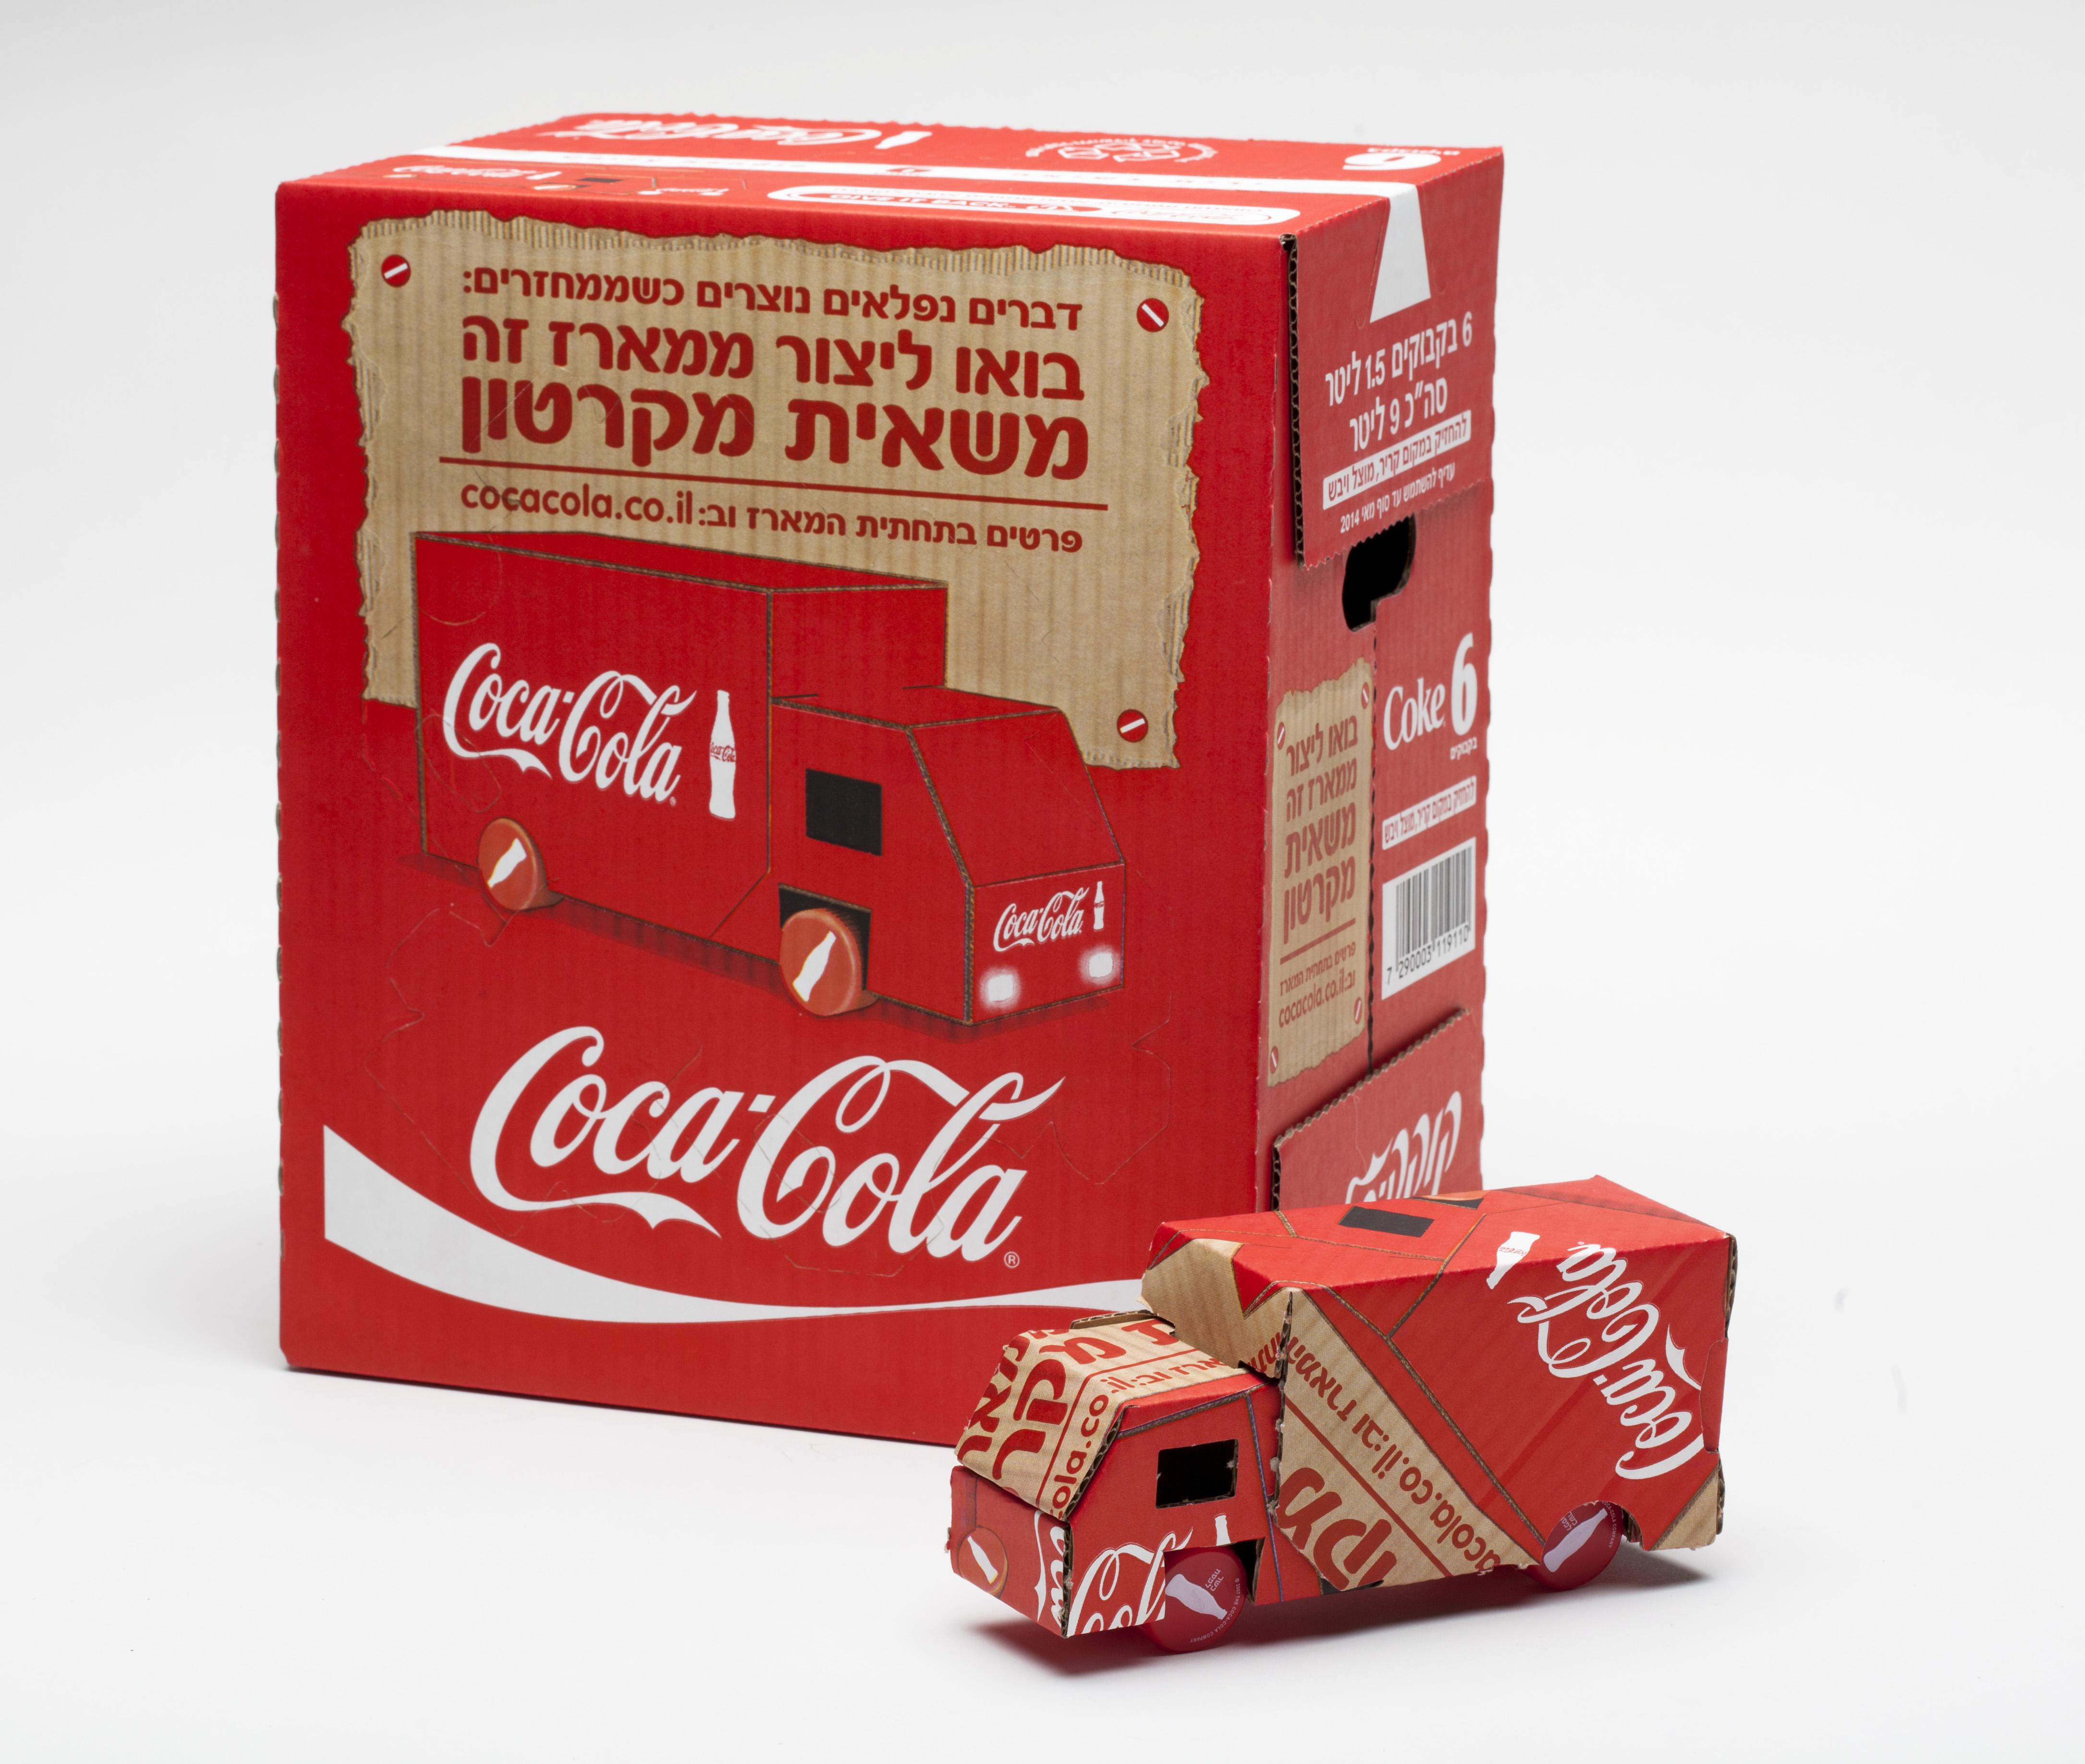 Coca-cola продолжает проект по утилизации